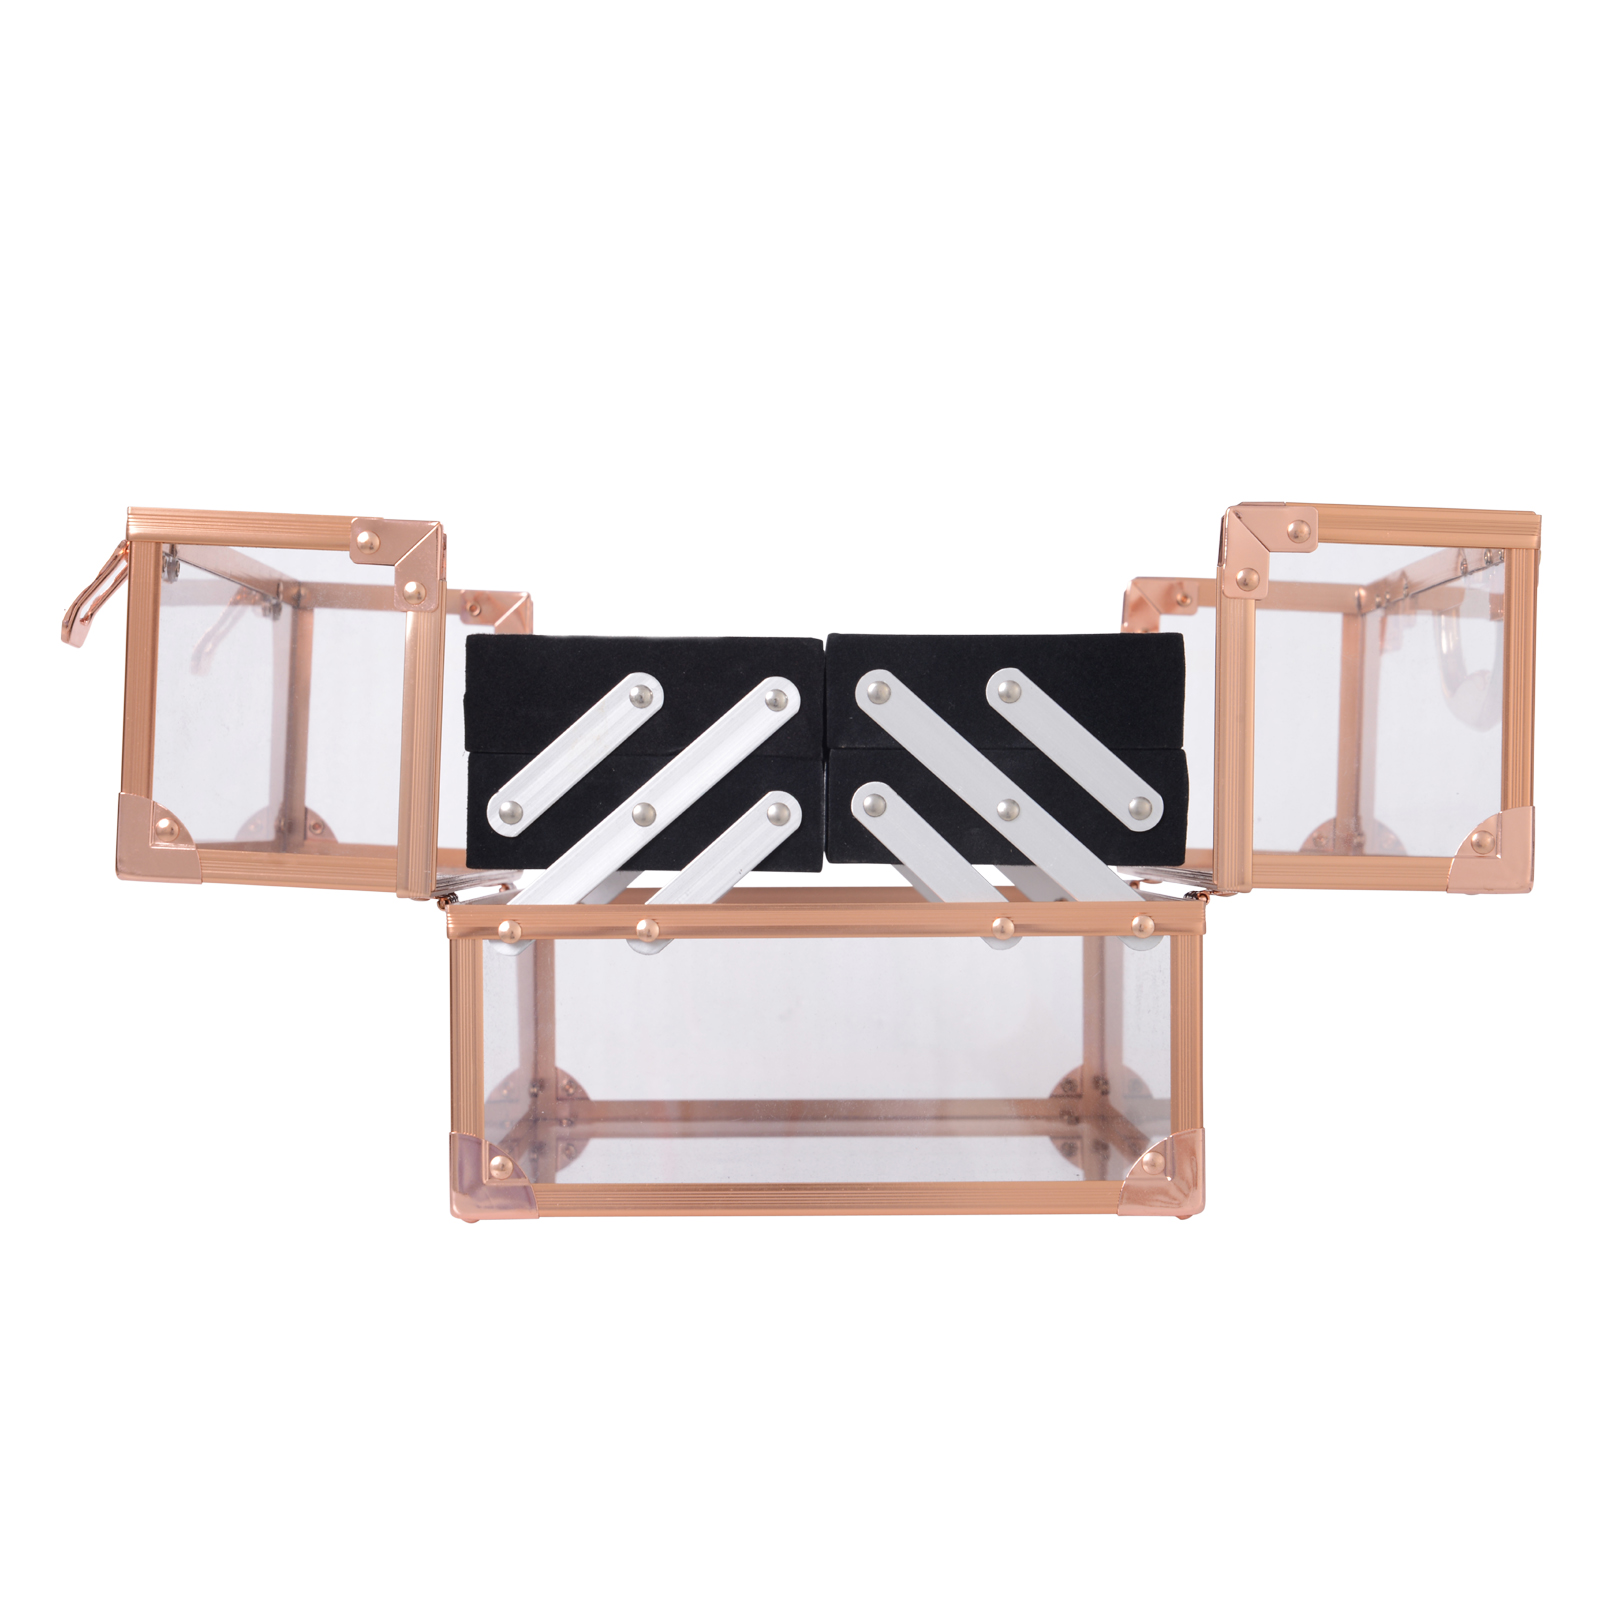 Portable-Makeup-Case-Train-Case-Lockable-Aluminum-with-4-Trays thumbnail 15